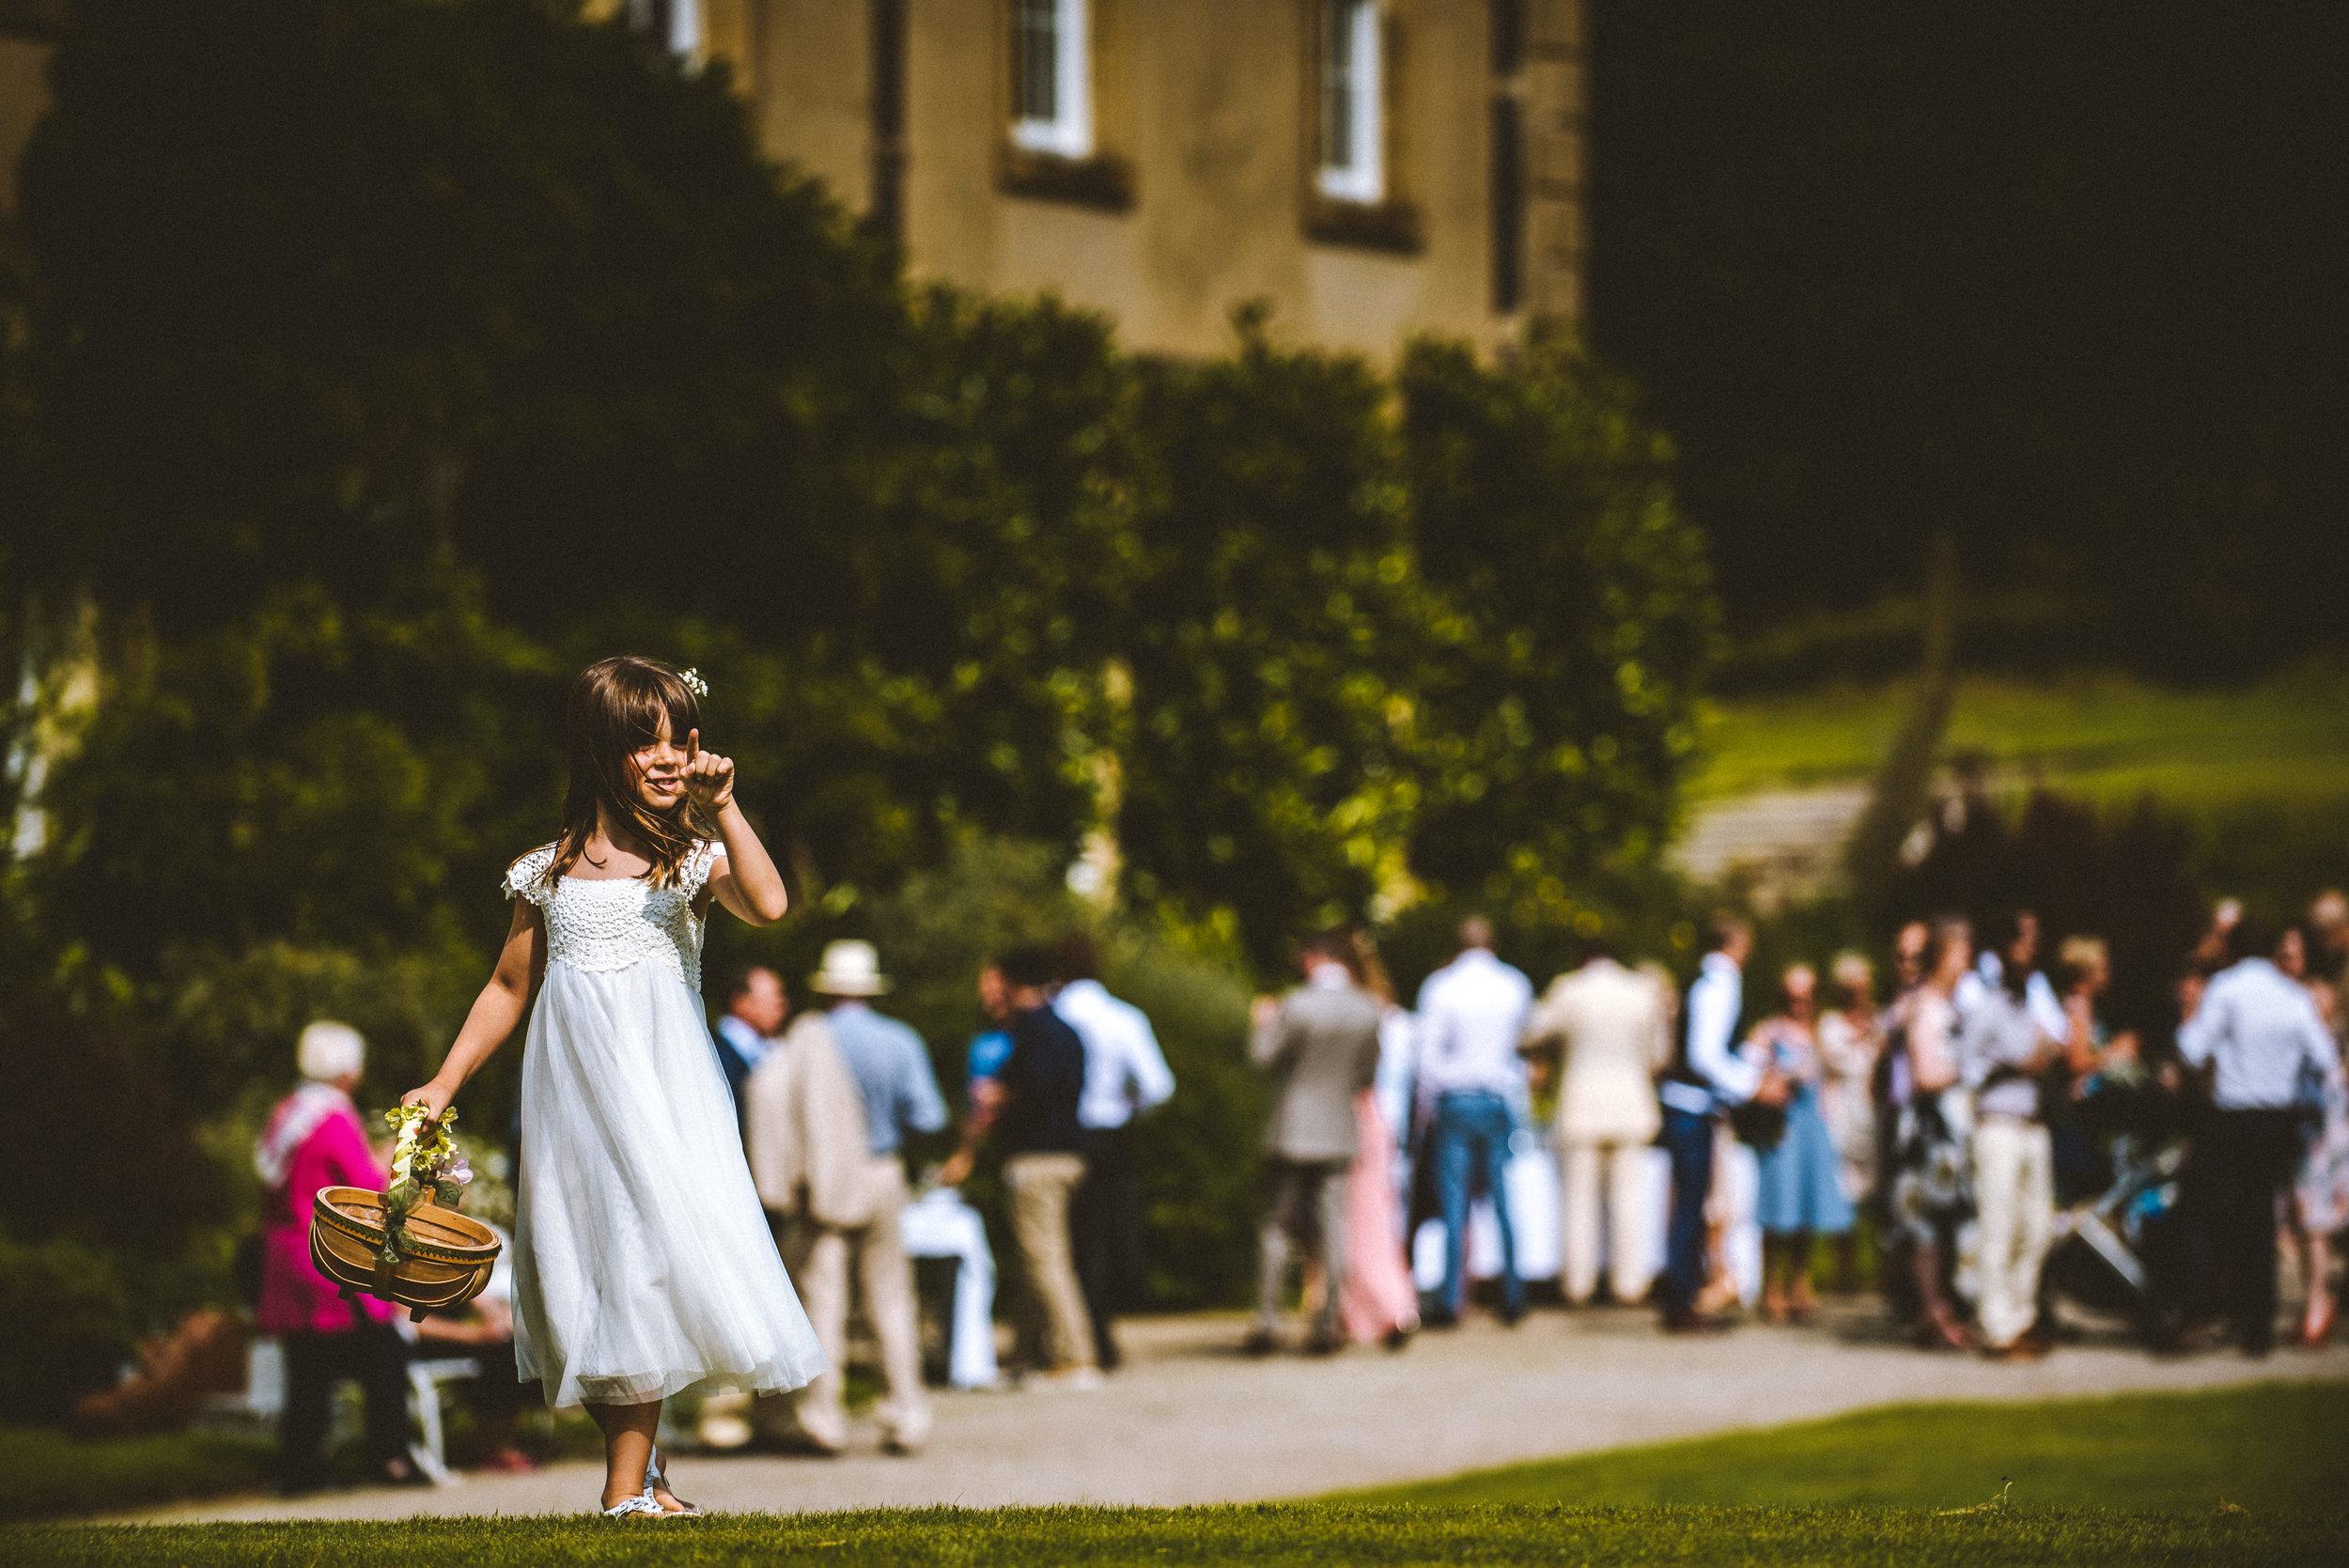 pencarrow-house-wedding-photographer-77.jpg